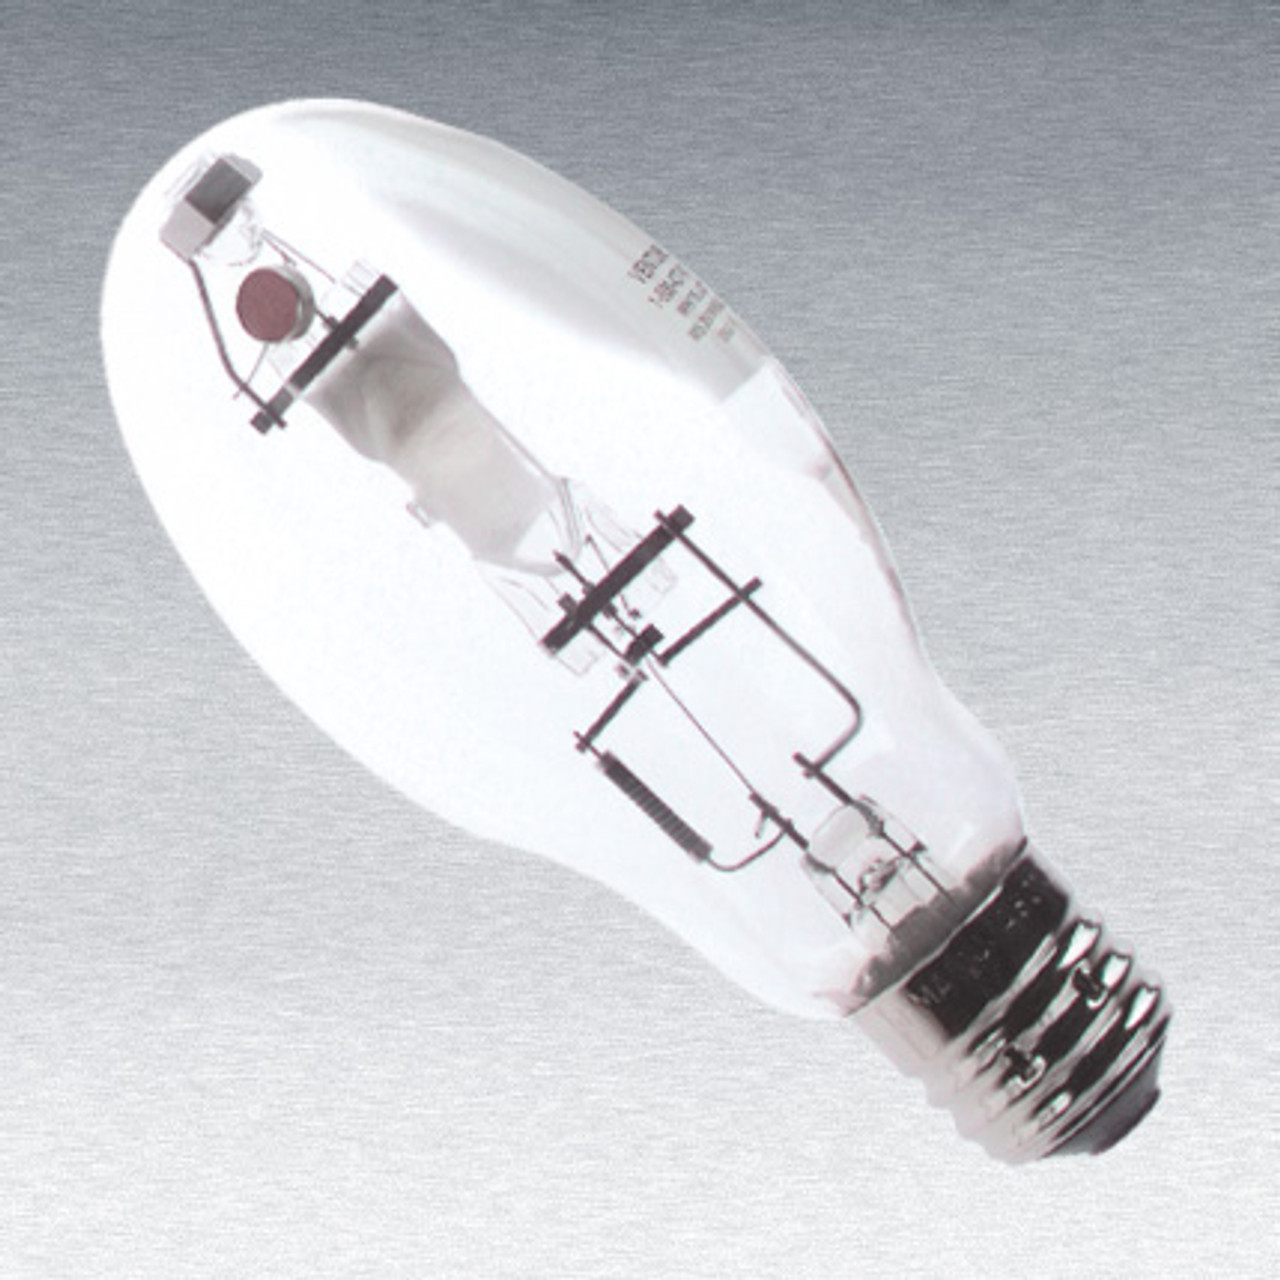 MH175W//ED17//E26//PS Pulse Start Metal Halide Lamp Light Bulb E26 Medium Base 175W